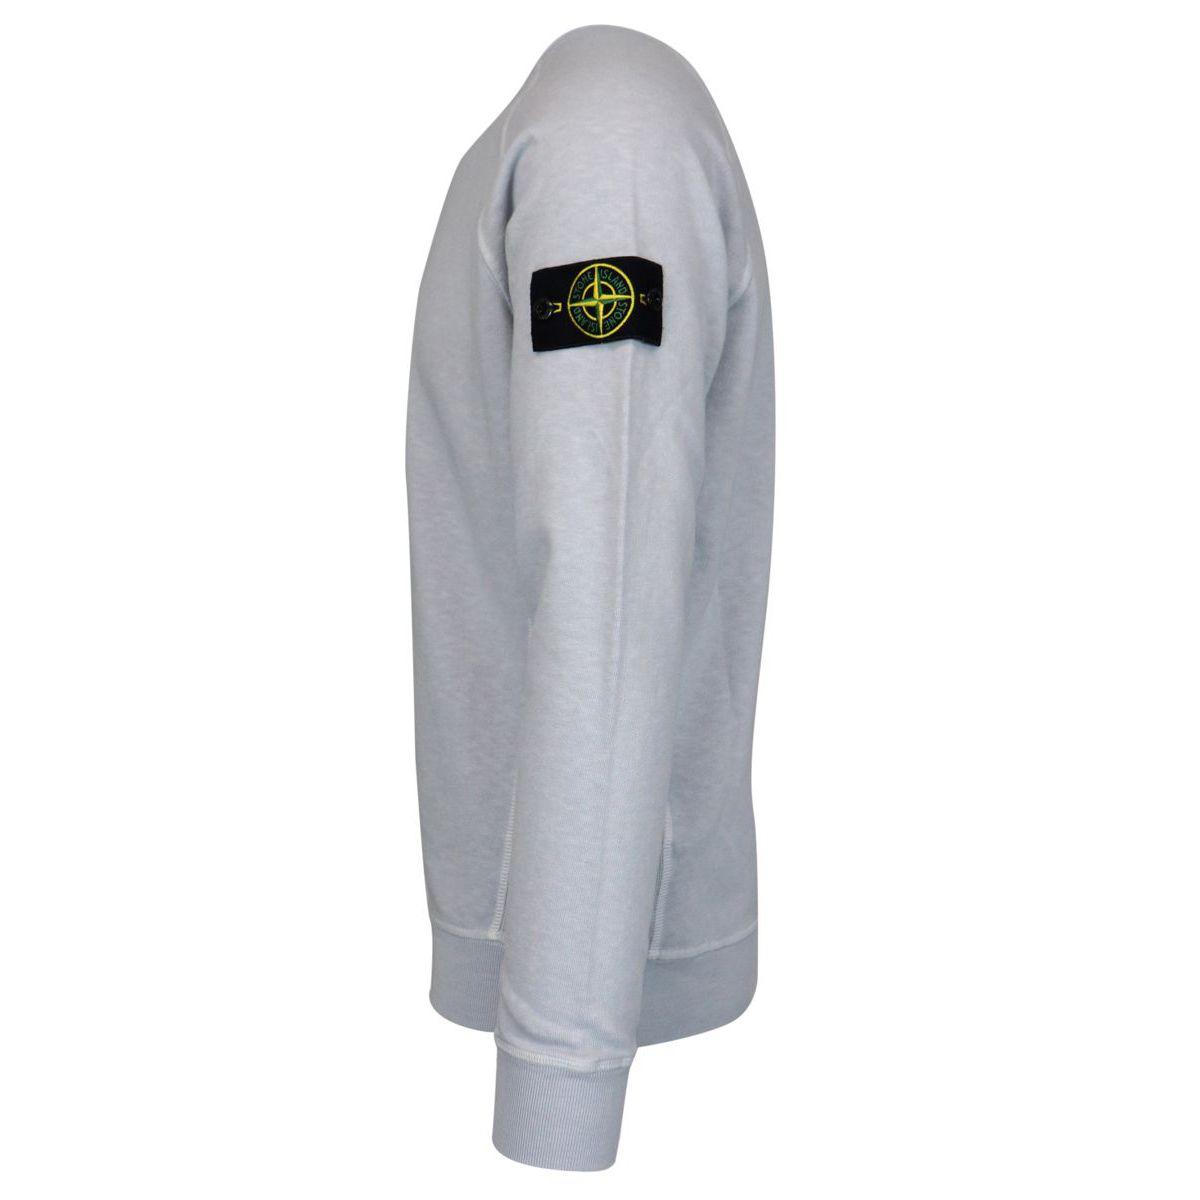 """Washed effect"" crewneck sweatshirt with logo patch Sky Stone Island"